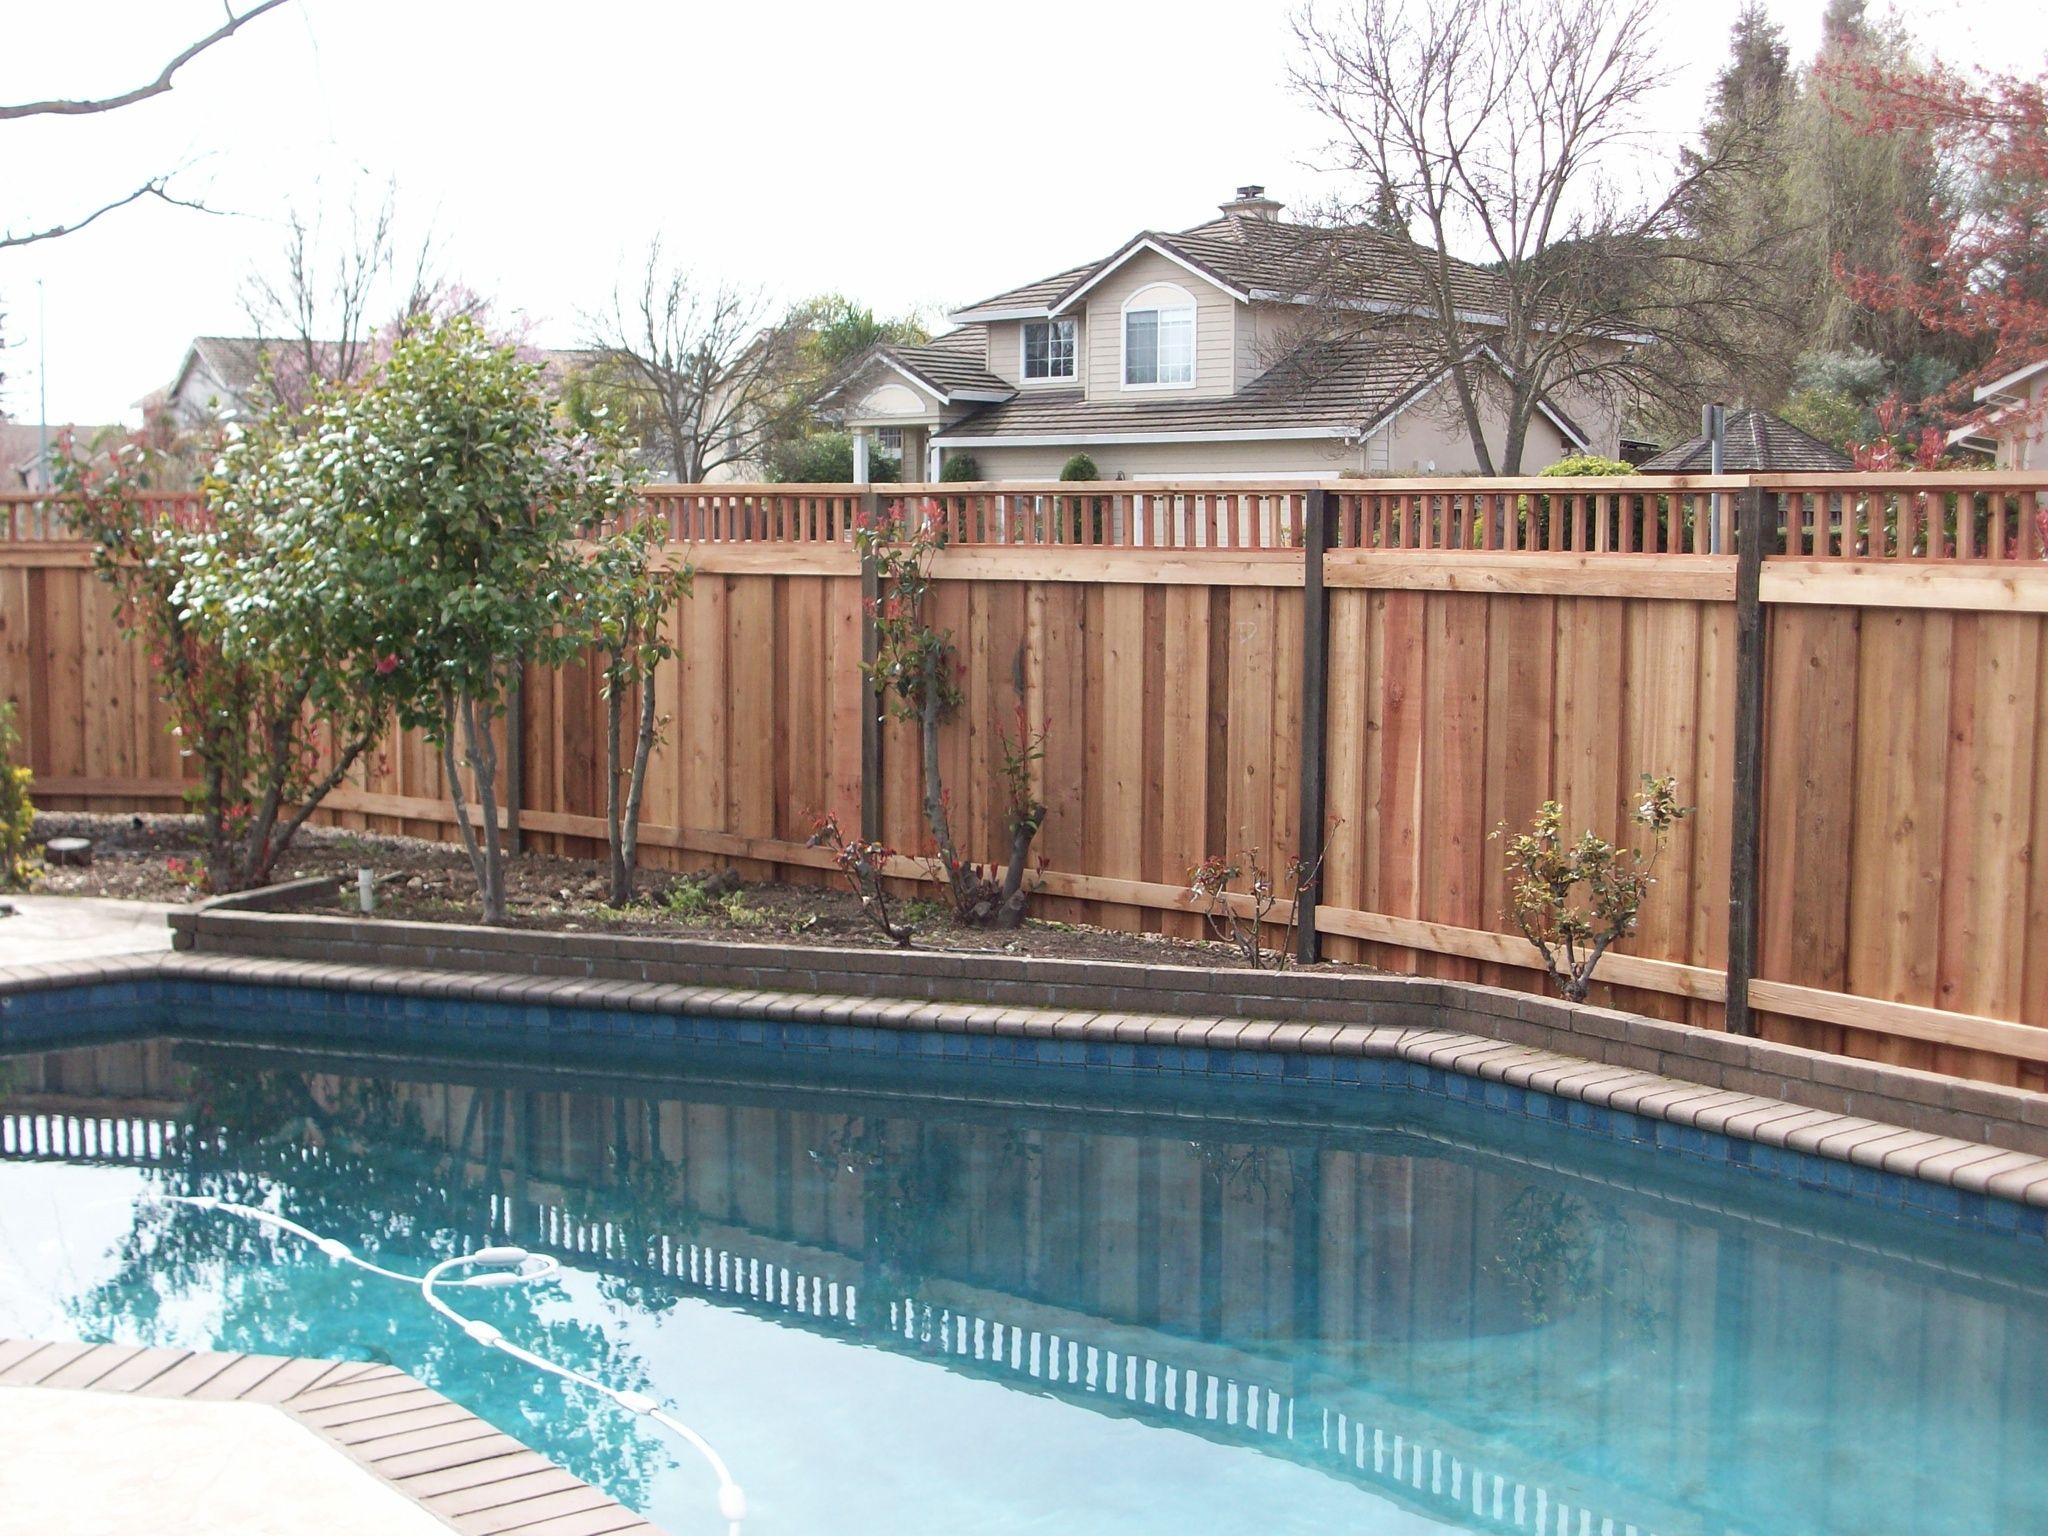 Pool Fence Pool houses, Diy backyard patio, Top treatments